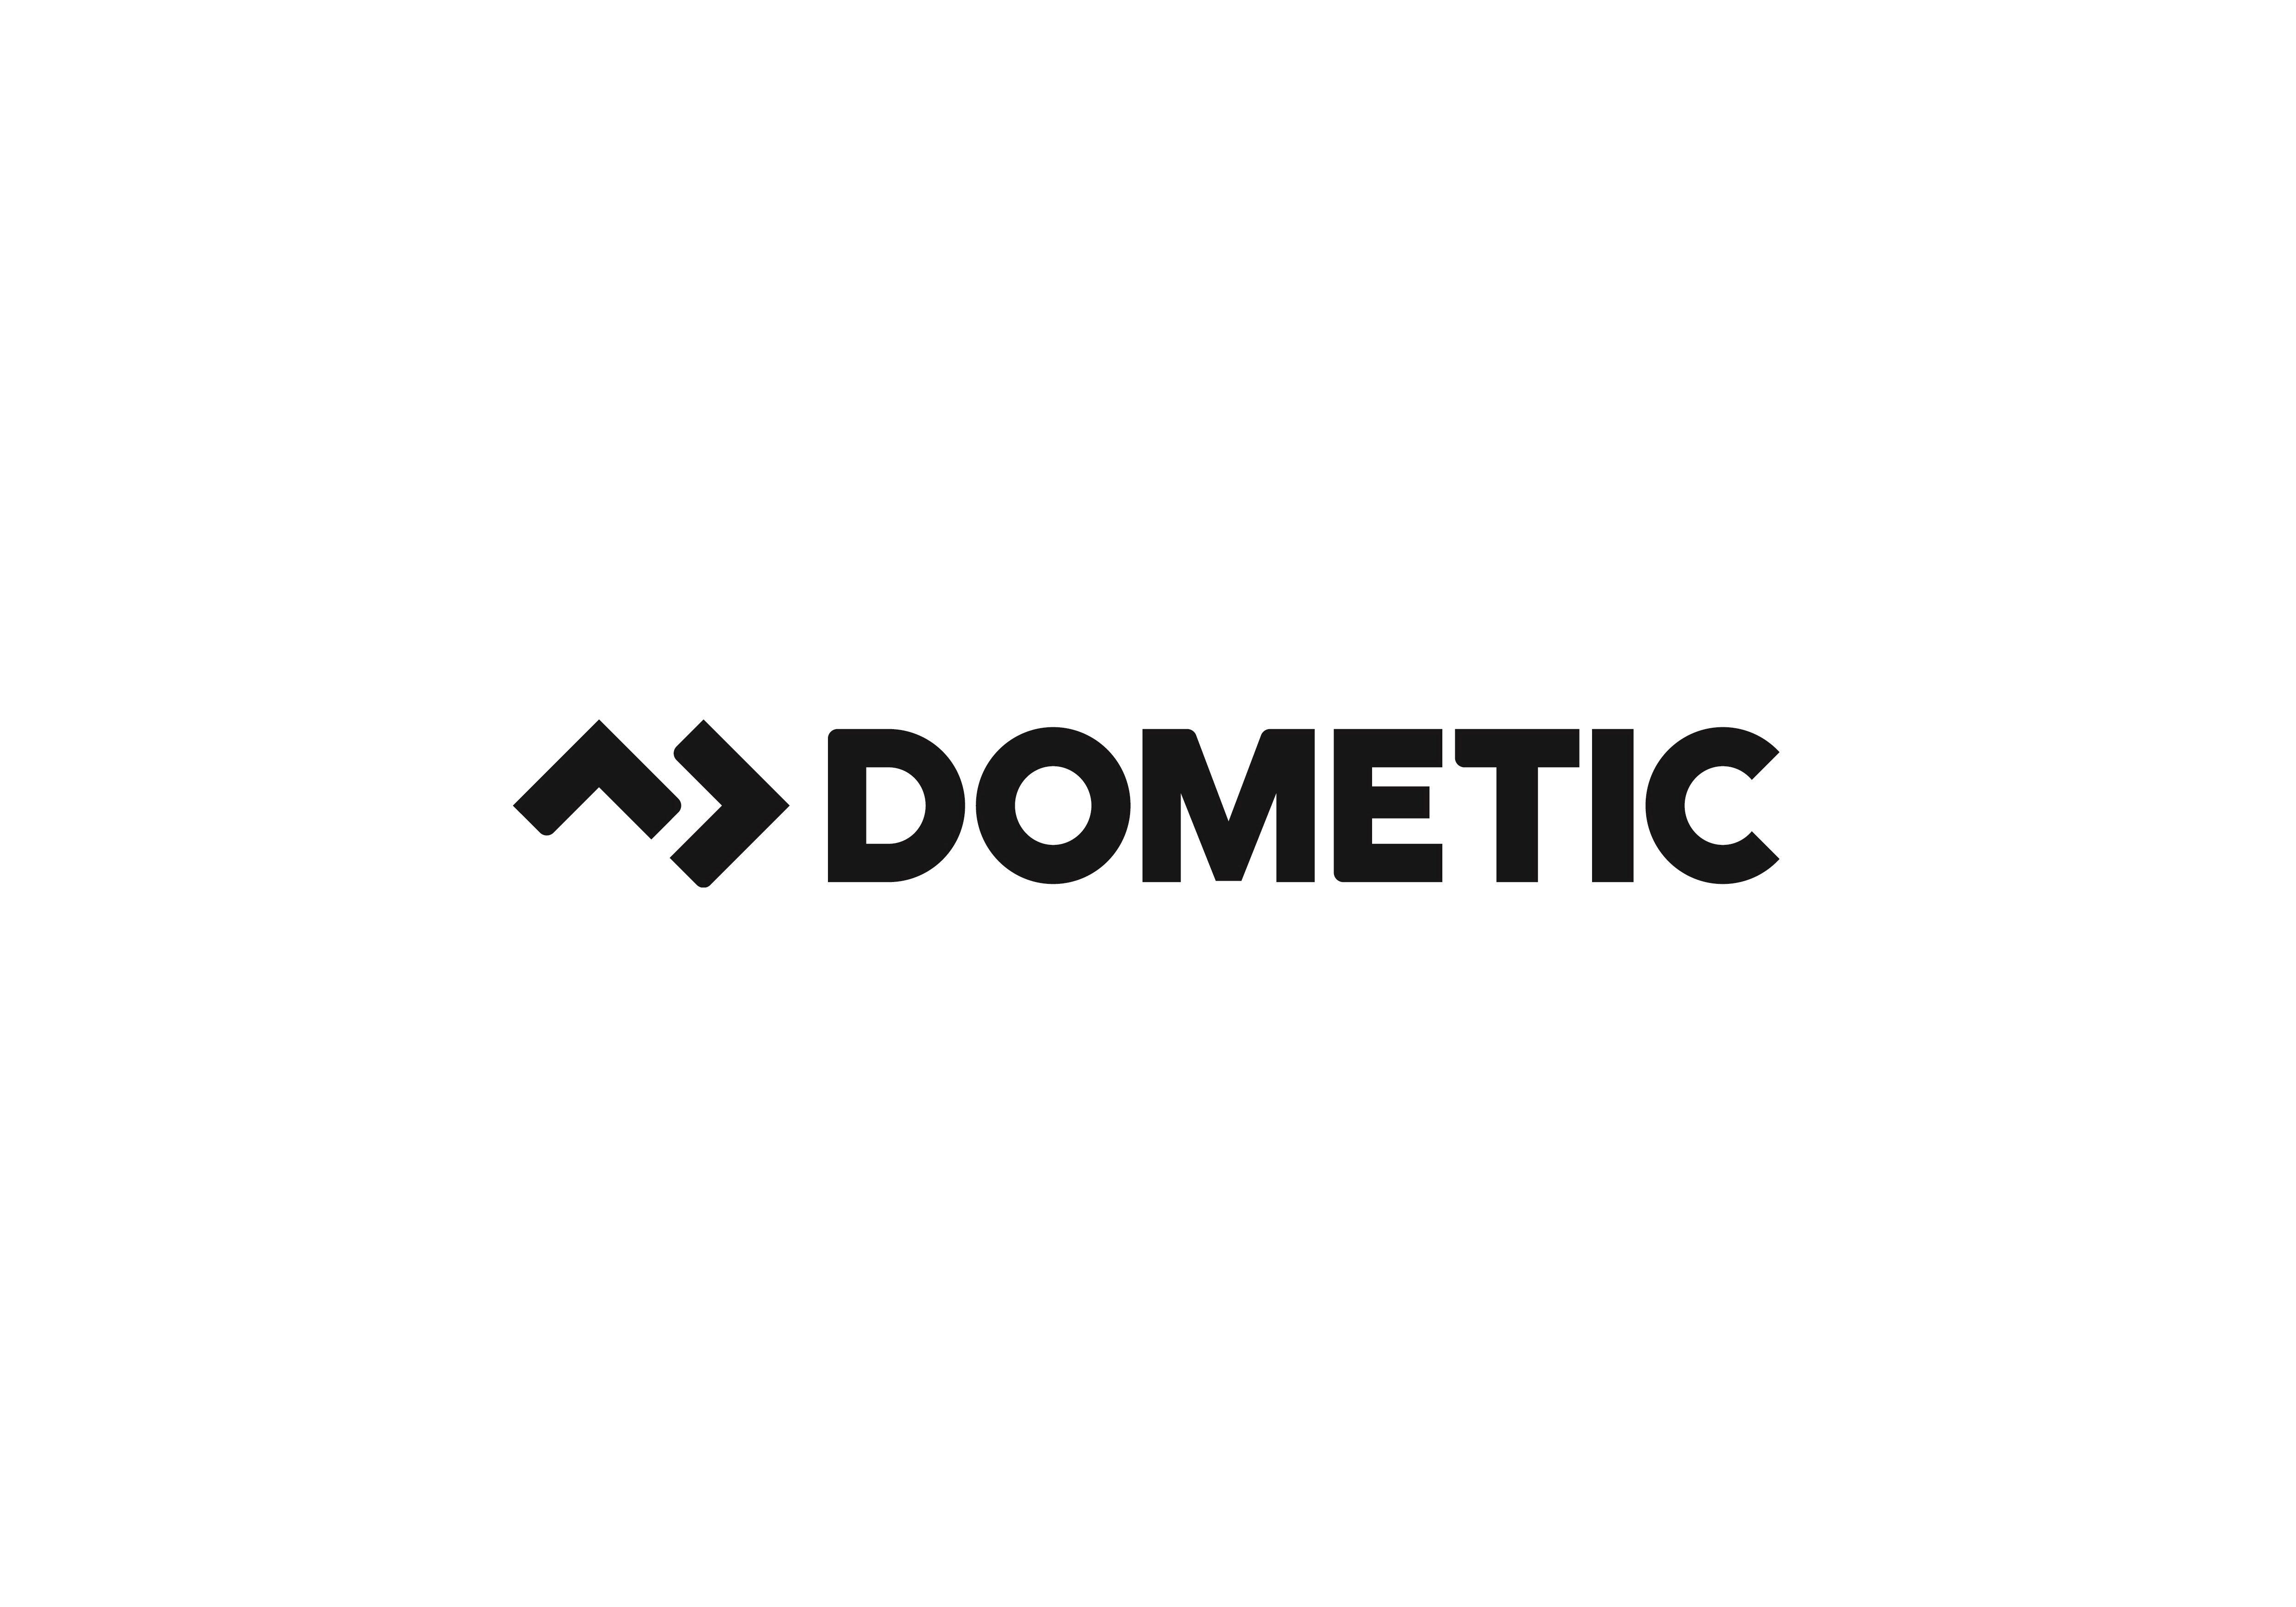 dometic-01